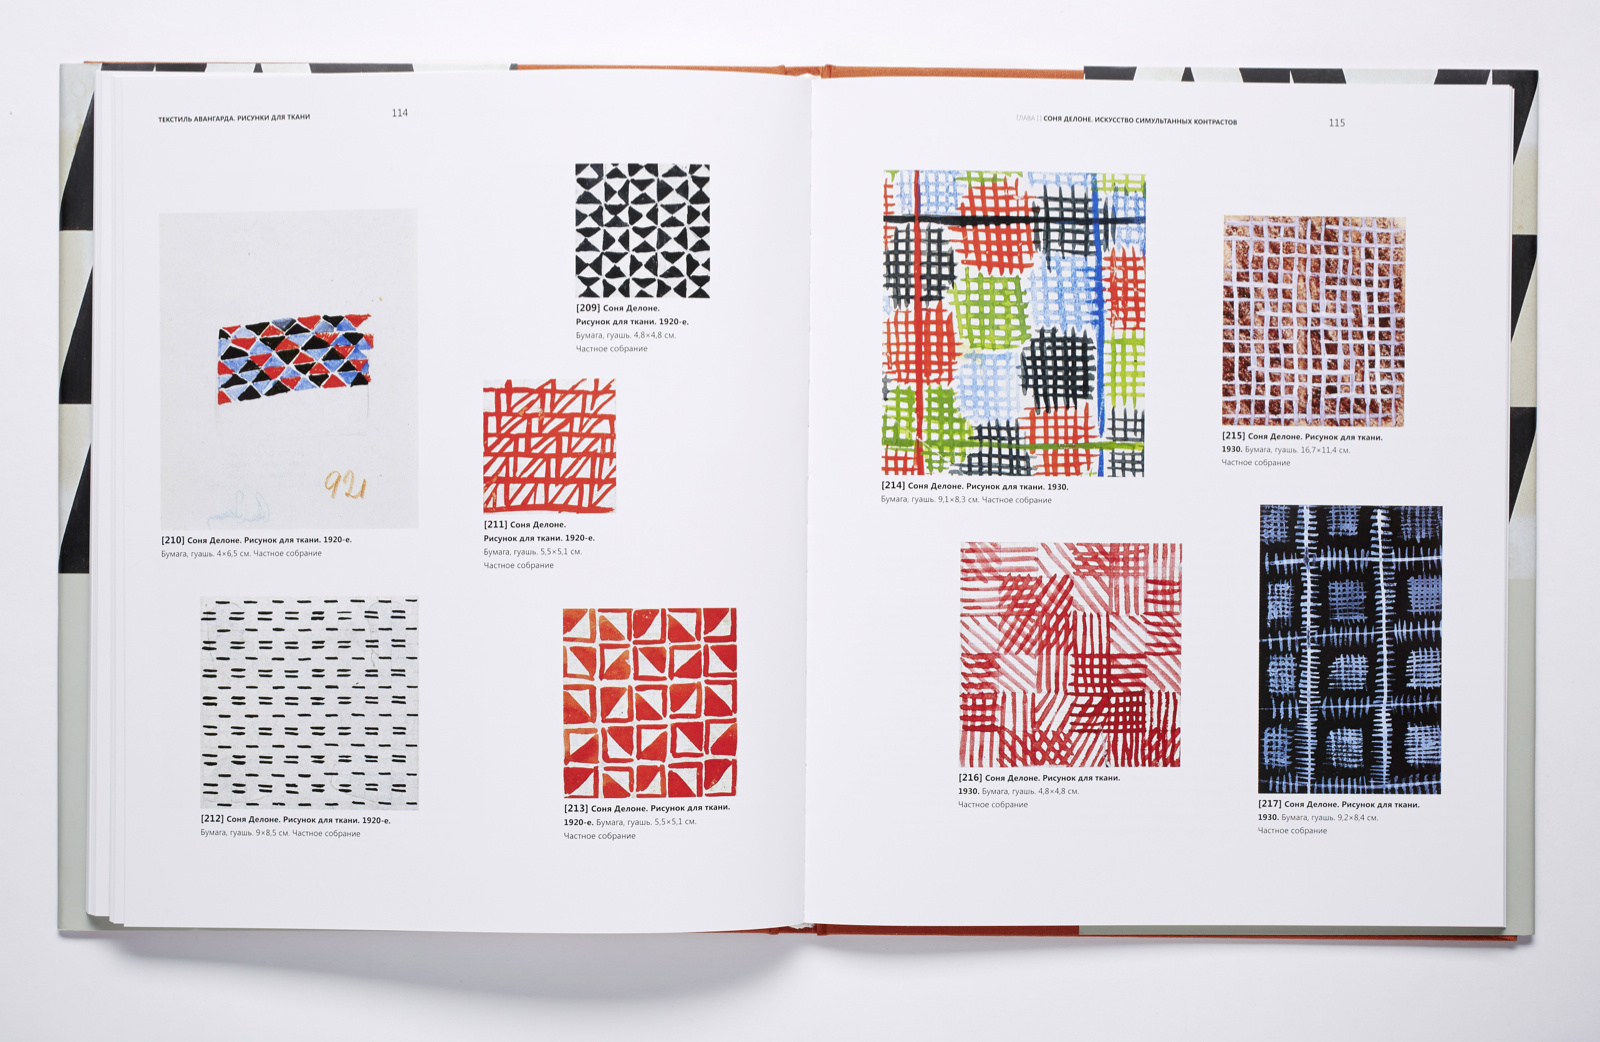 Past perfect: текстиль в русском авангарде и сегодня (галерея 19, фото 1)